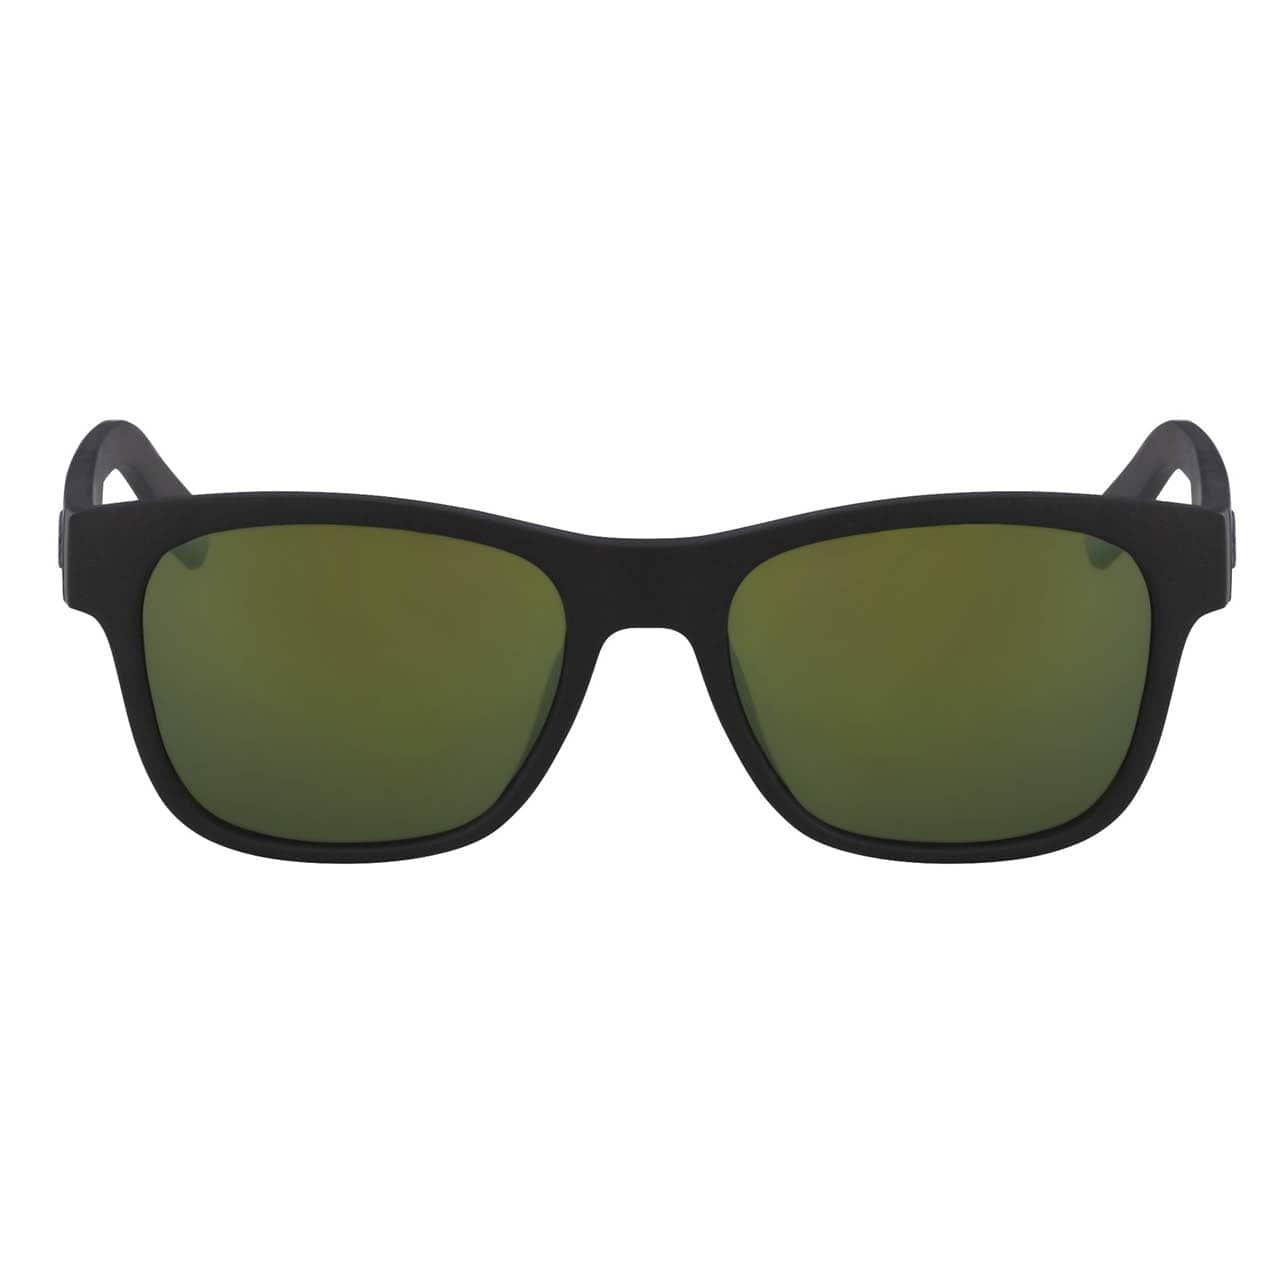 Unisex Plastic Rectangular Novak Djokovic Capsule Collection Sunglasses